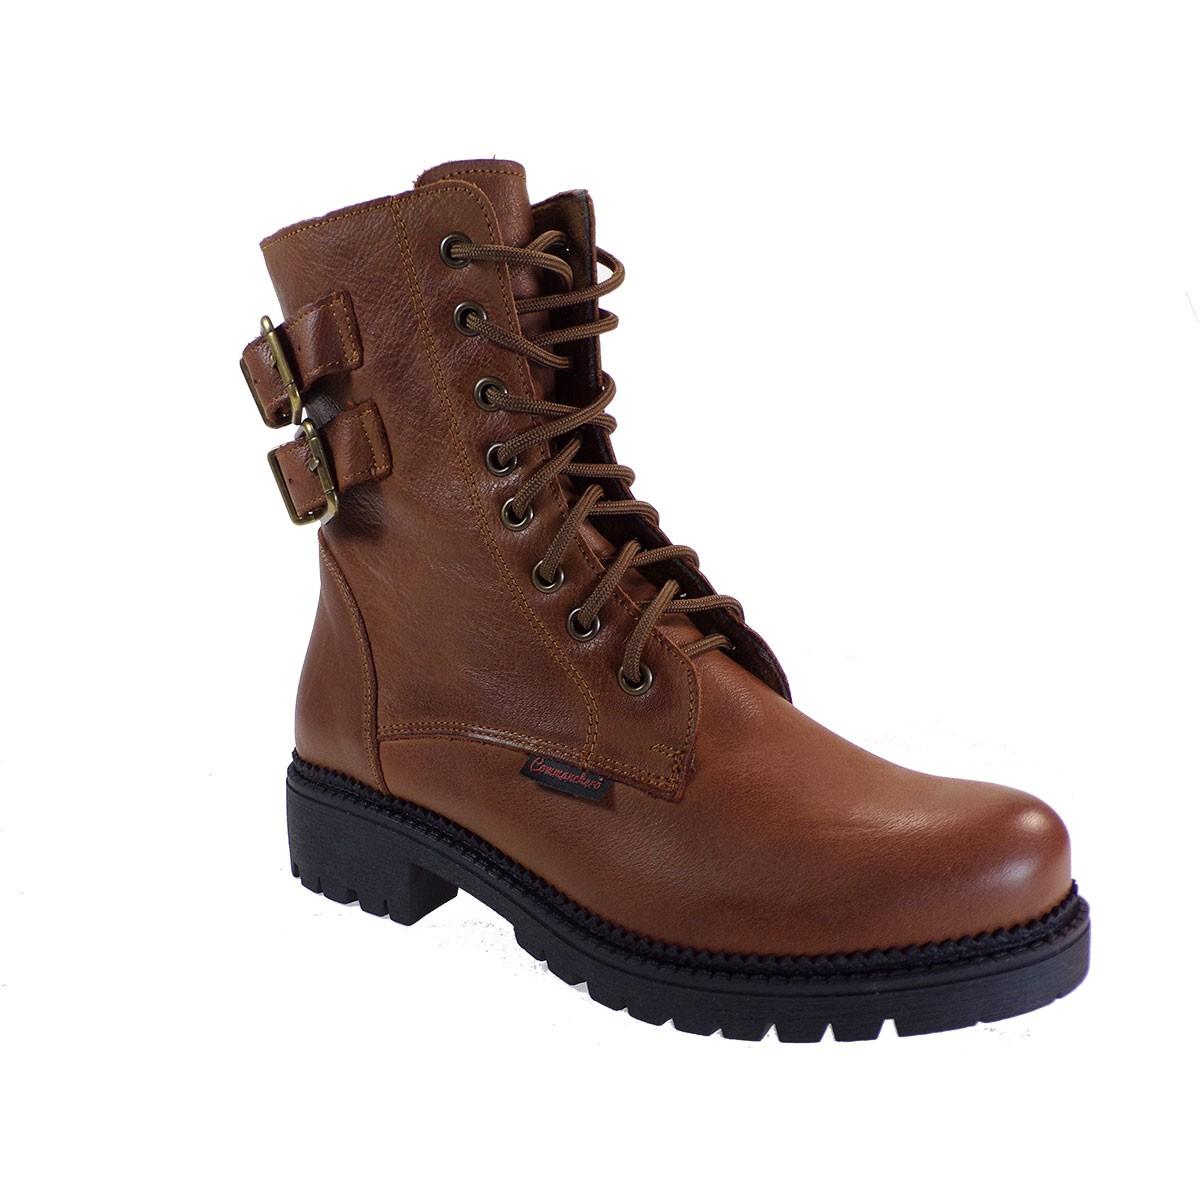 Commanchero Γυναικεία Παπούτσια Μποτάκια Αρβυλάκια 5776-726 Ταμπά Δέρμα